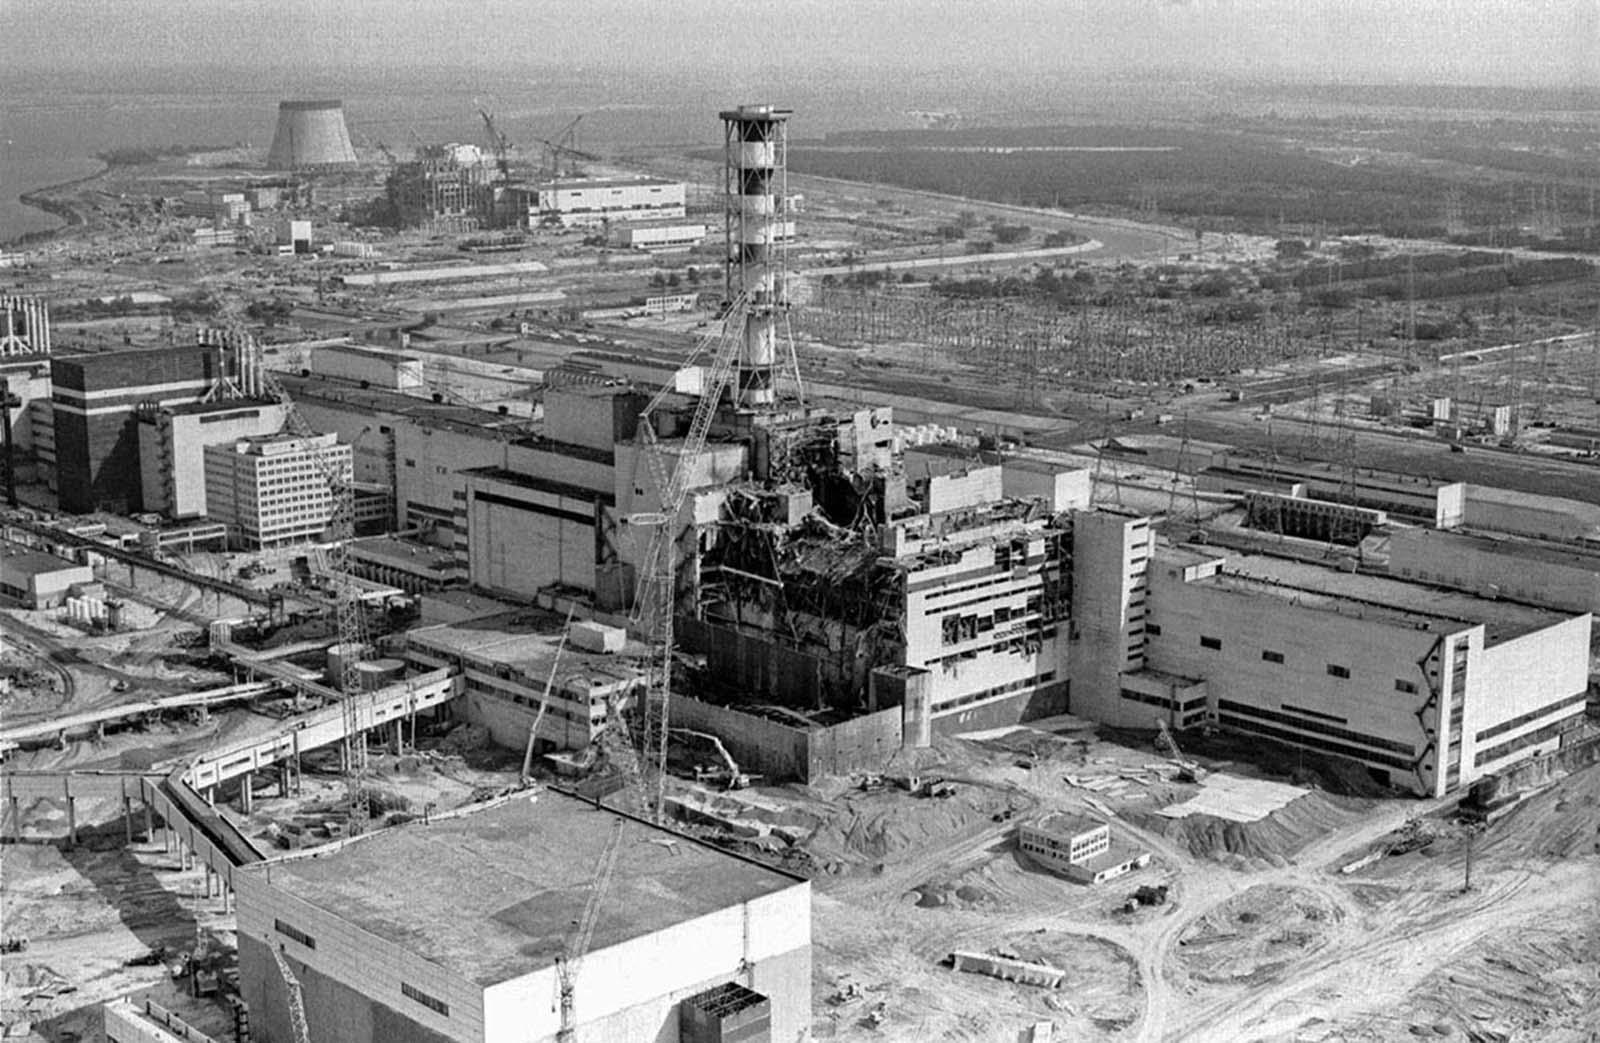 1986: Чернобилската авария в редки снимки - Фото галерии | Vesti.bg